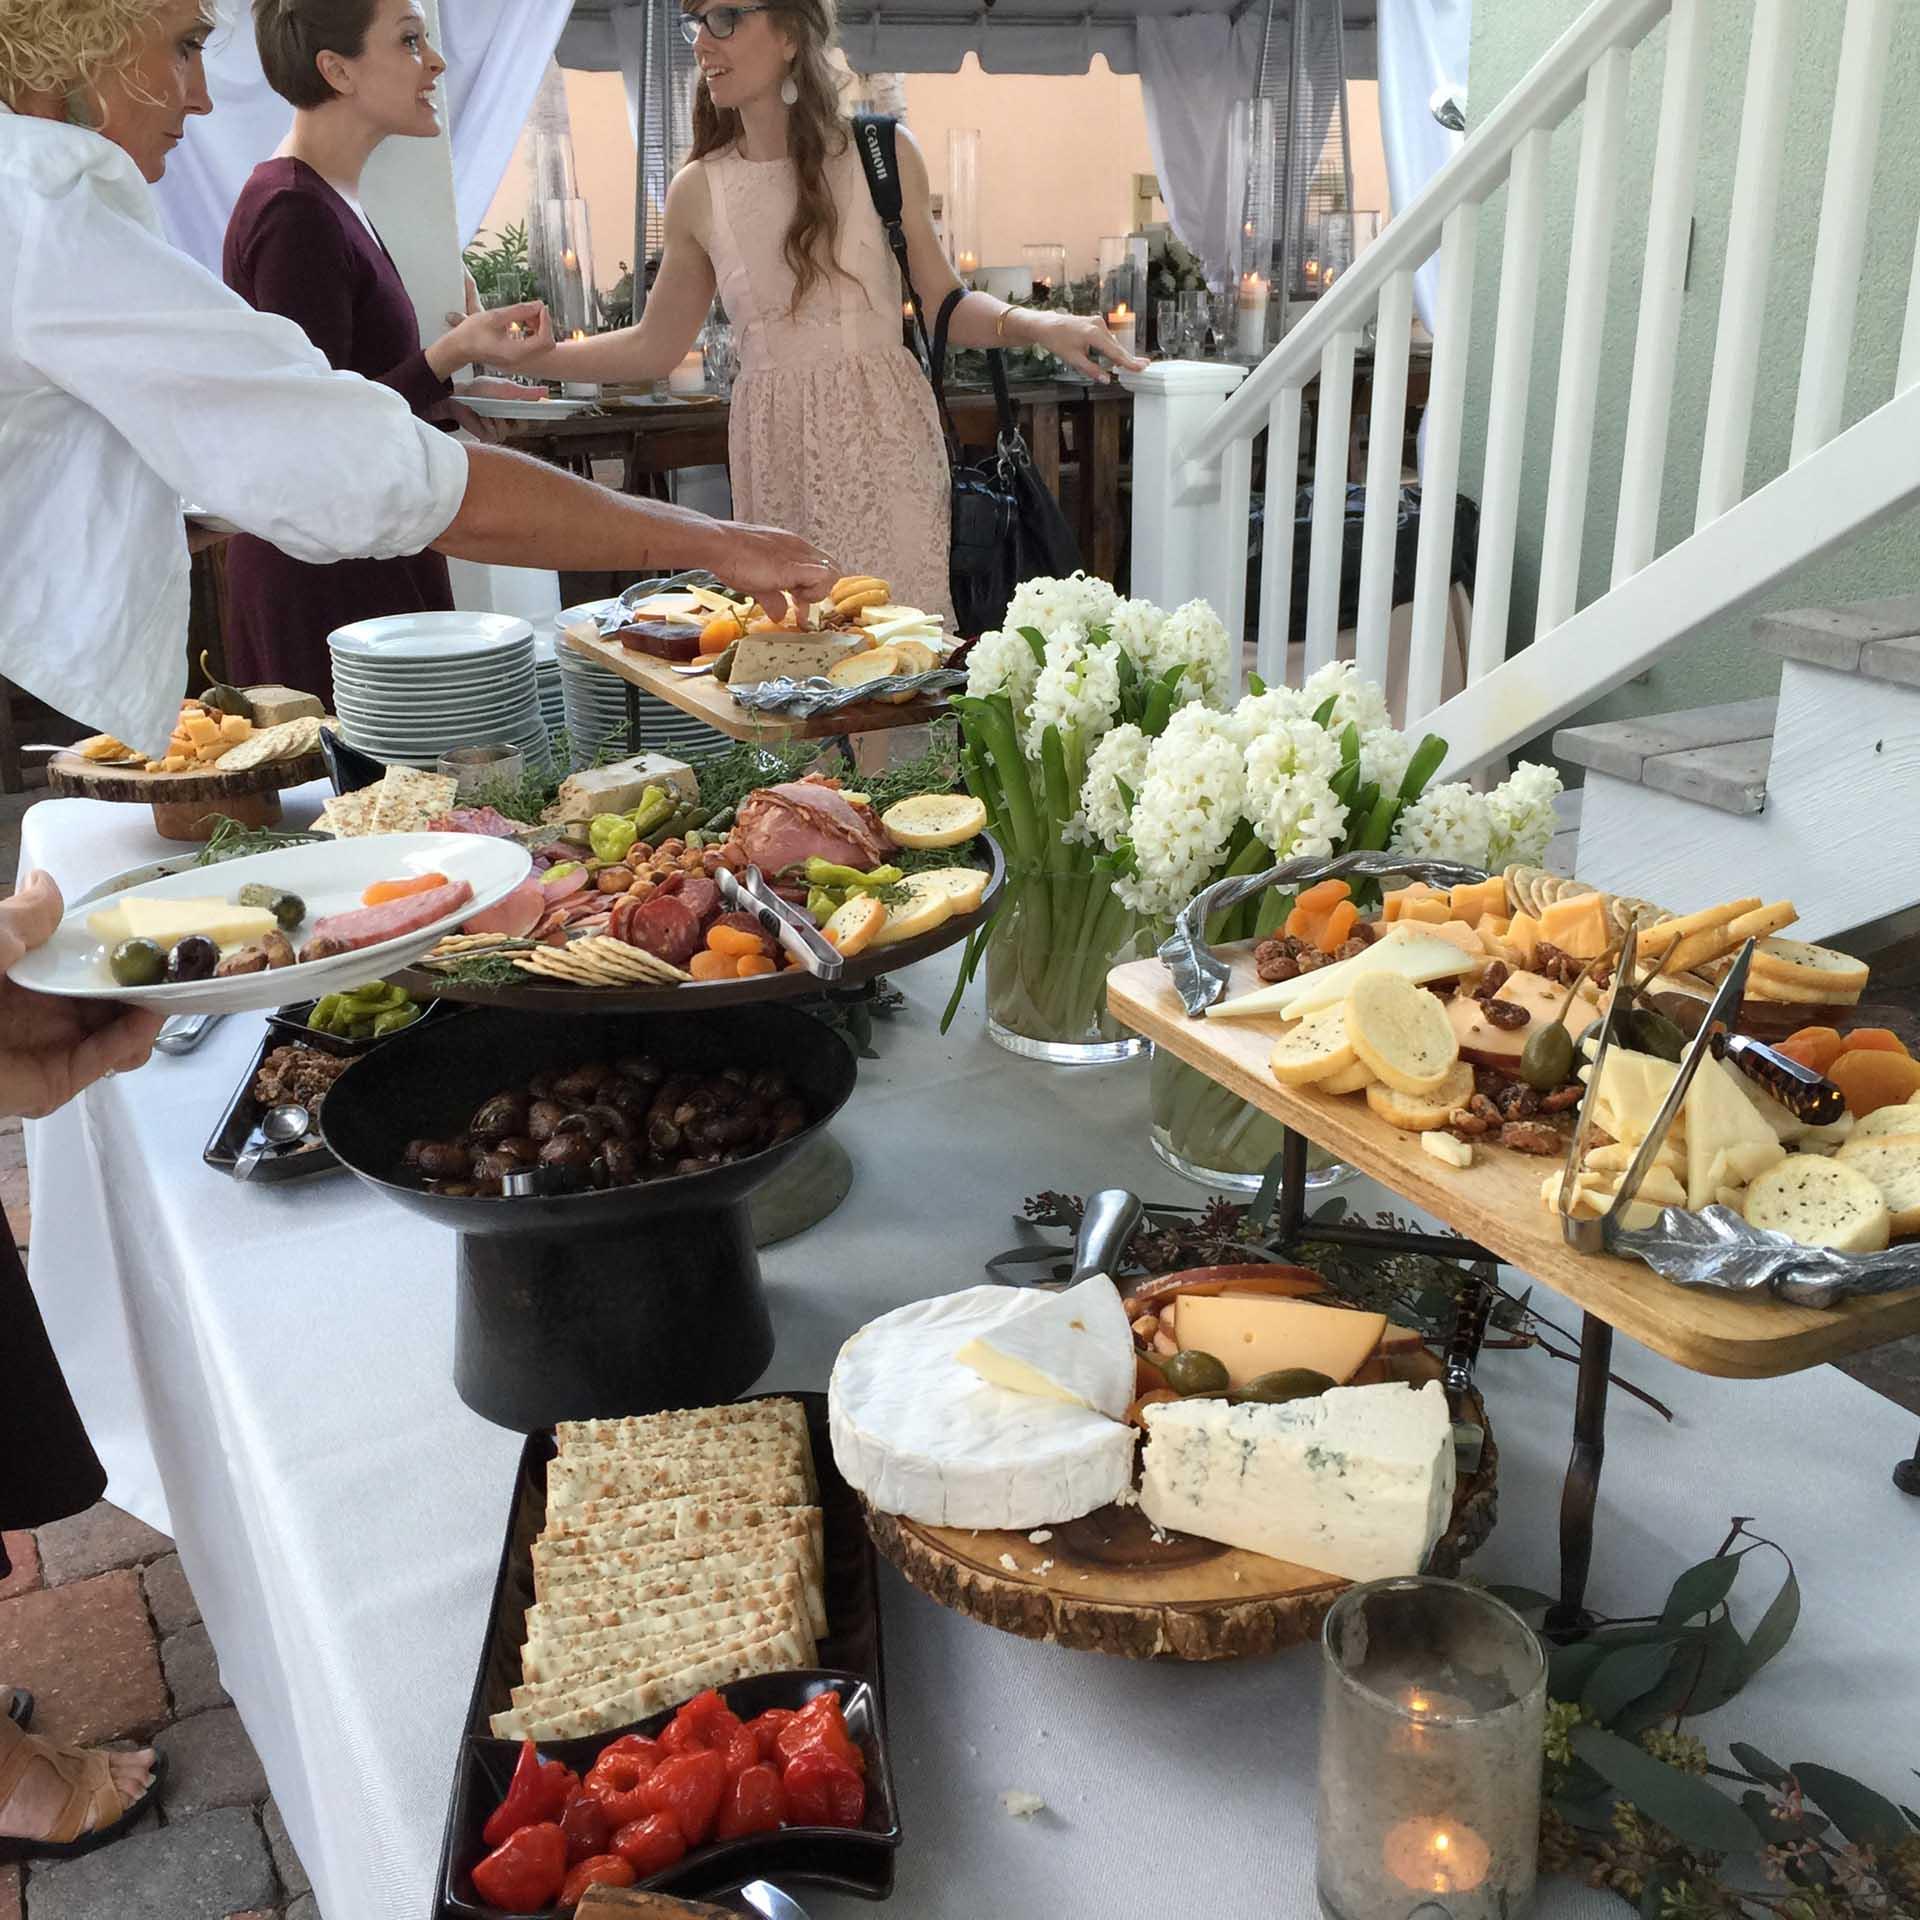 Food being served at wedding